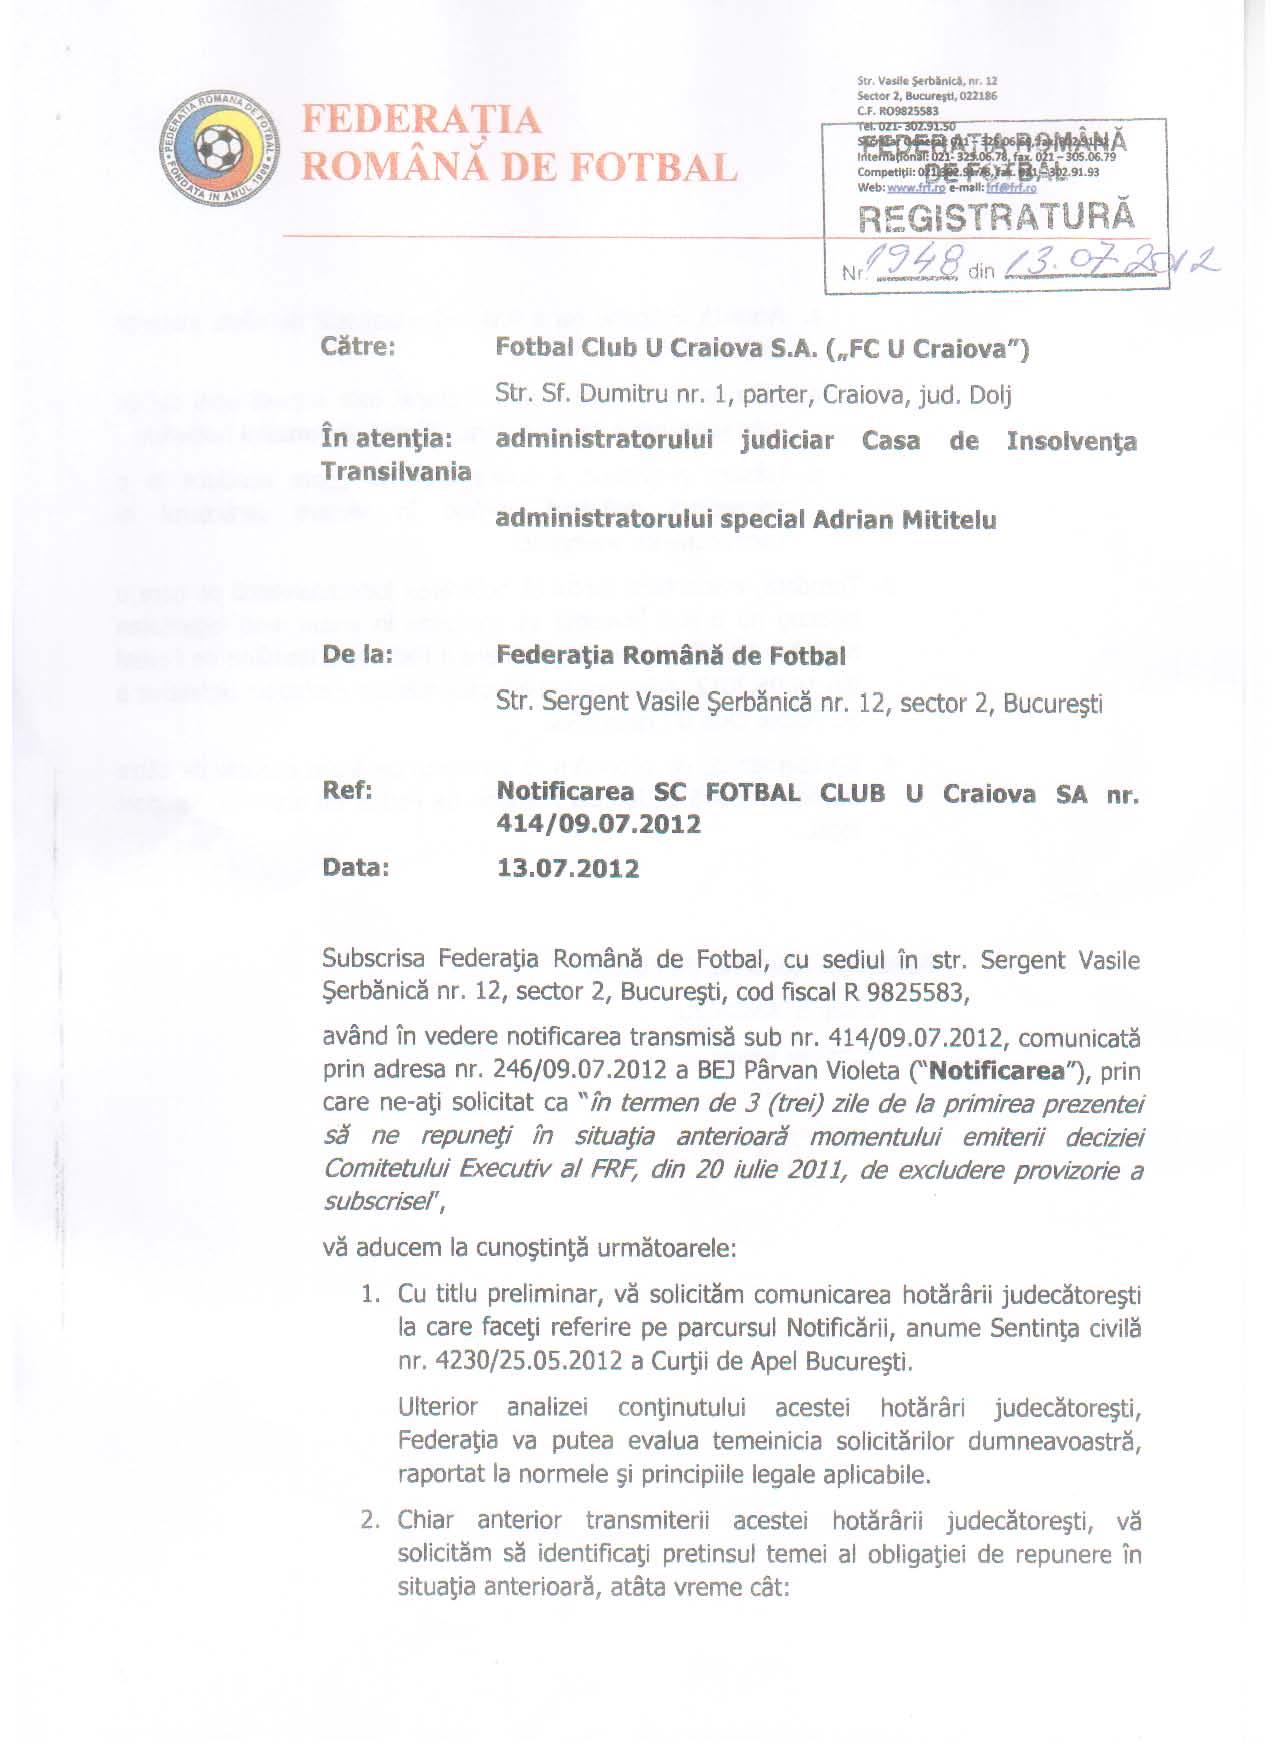 504589-pag-1-frf-raspuns-notificare-13-iulie-2012.jpg